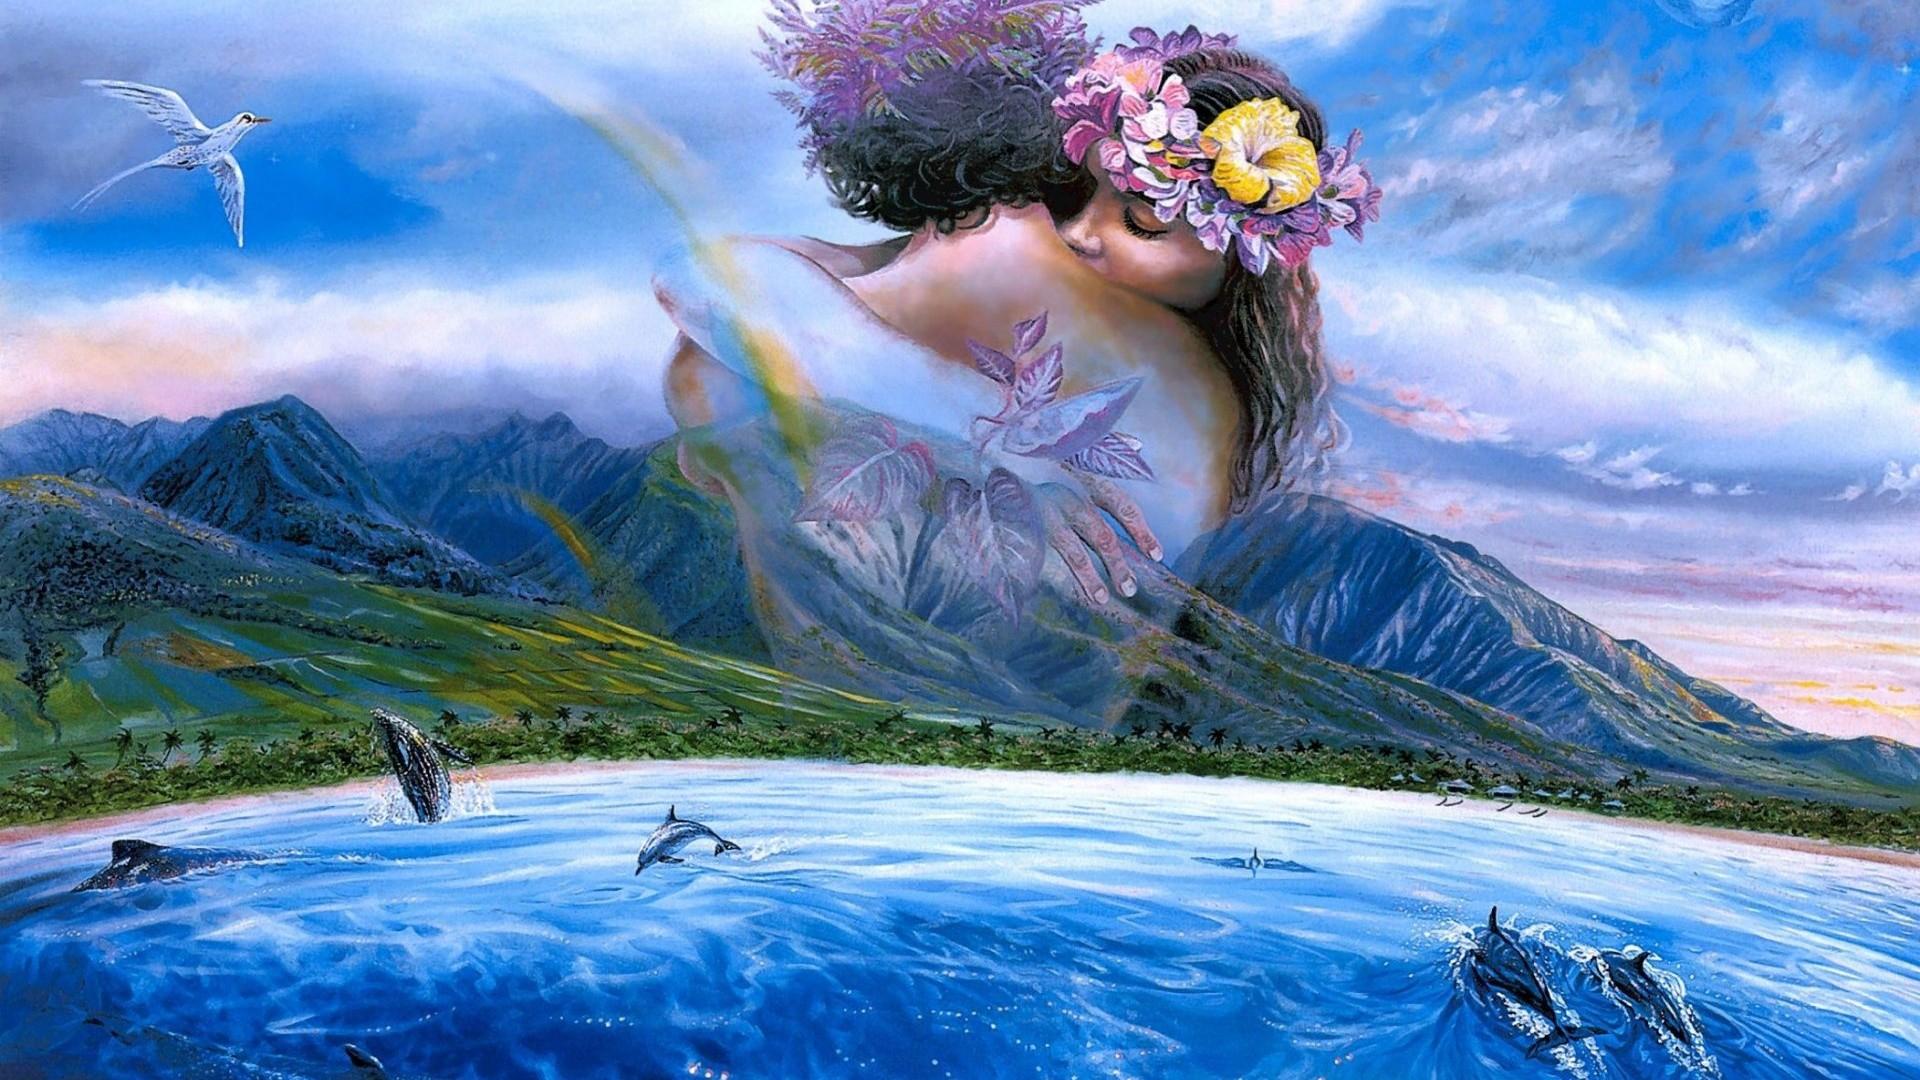 Nature Love Wallpaper Hd 1080p 14 Nature Love Wallpaper - Nature Wallpaper Hd Love , HD Wallpaper & Backgrounds